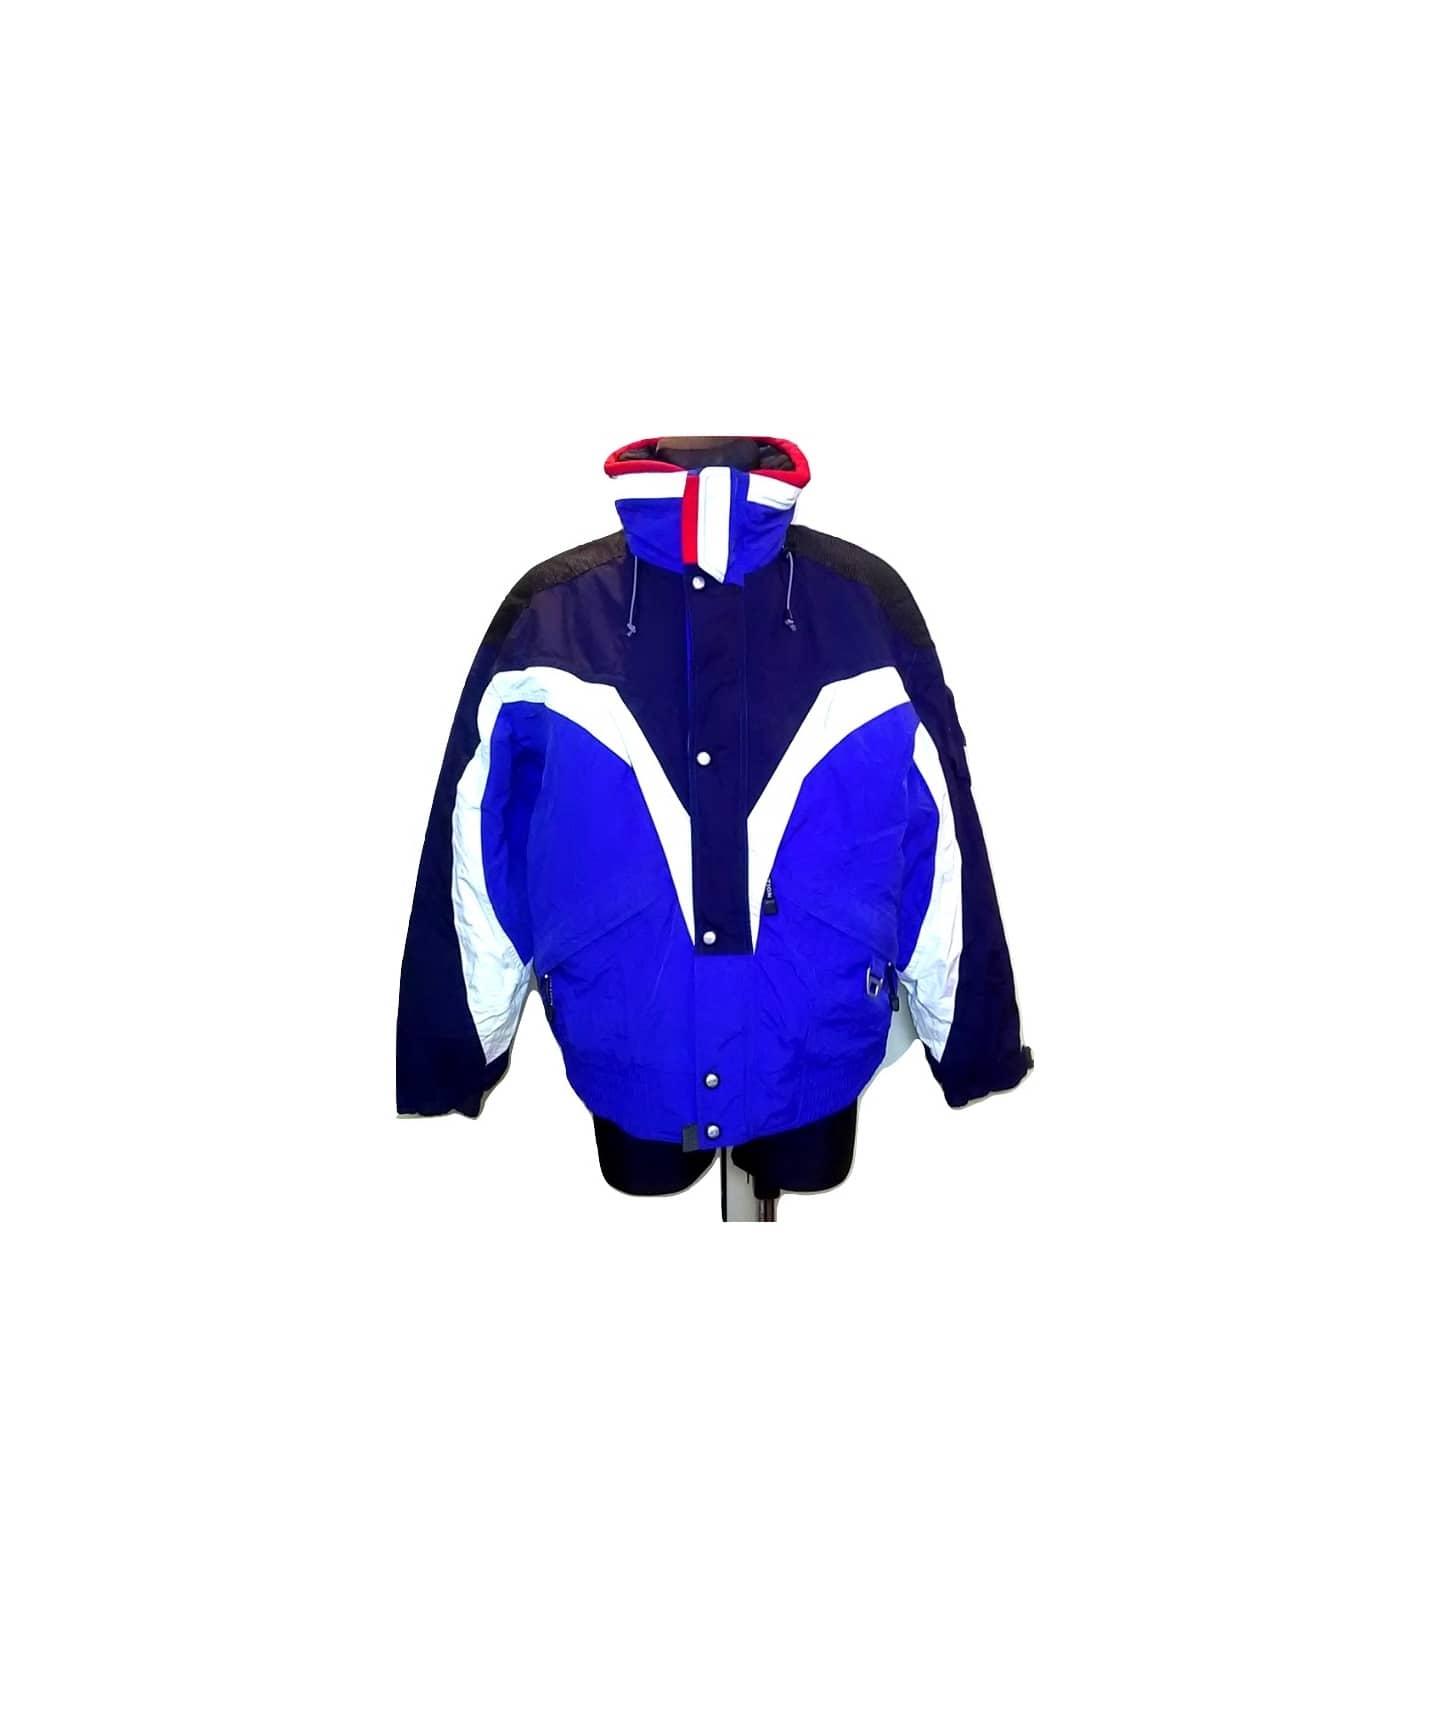 Mėlynas bliuzonas, MOTION, 52 dydis